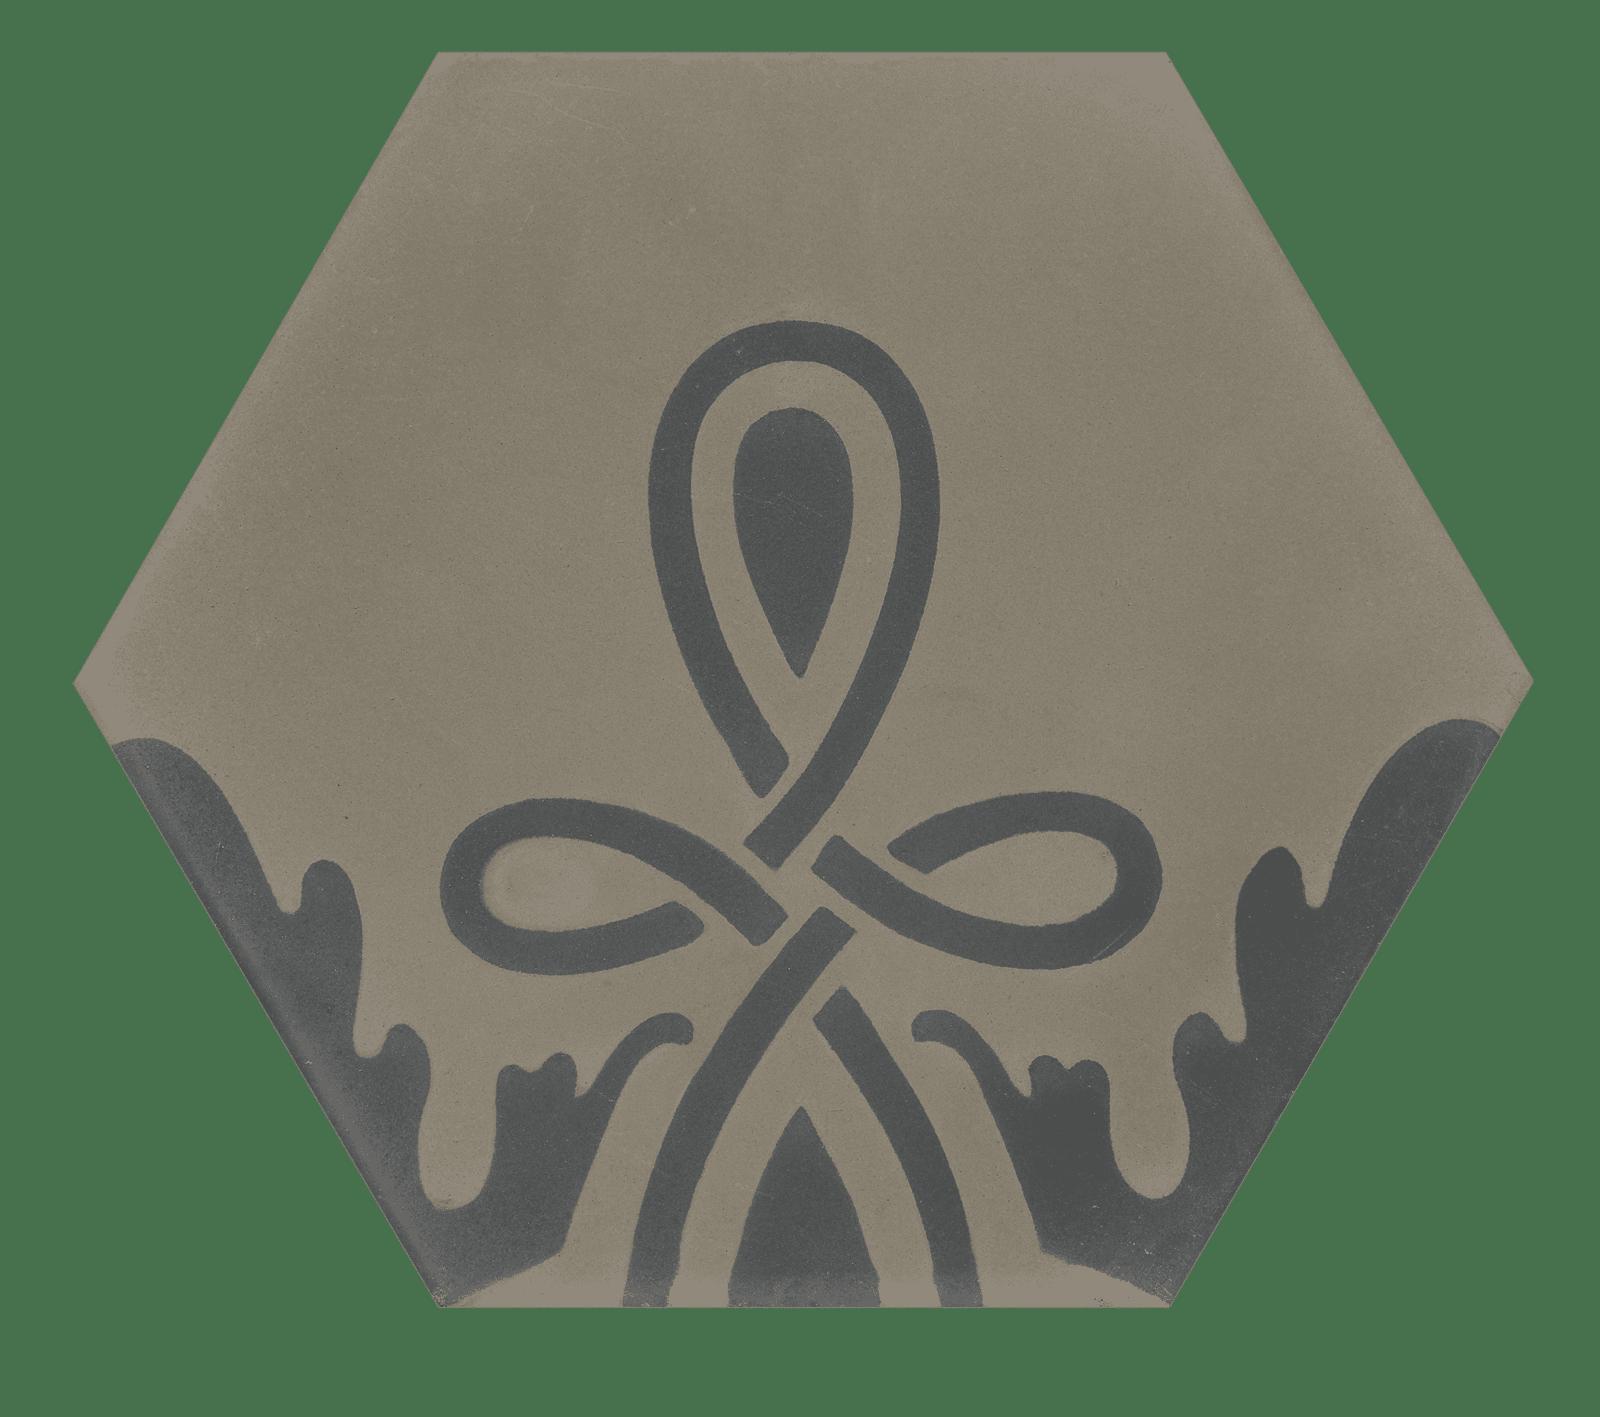 zementmosaikfliesen-600161-viaplatten | 600161